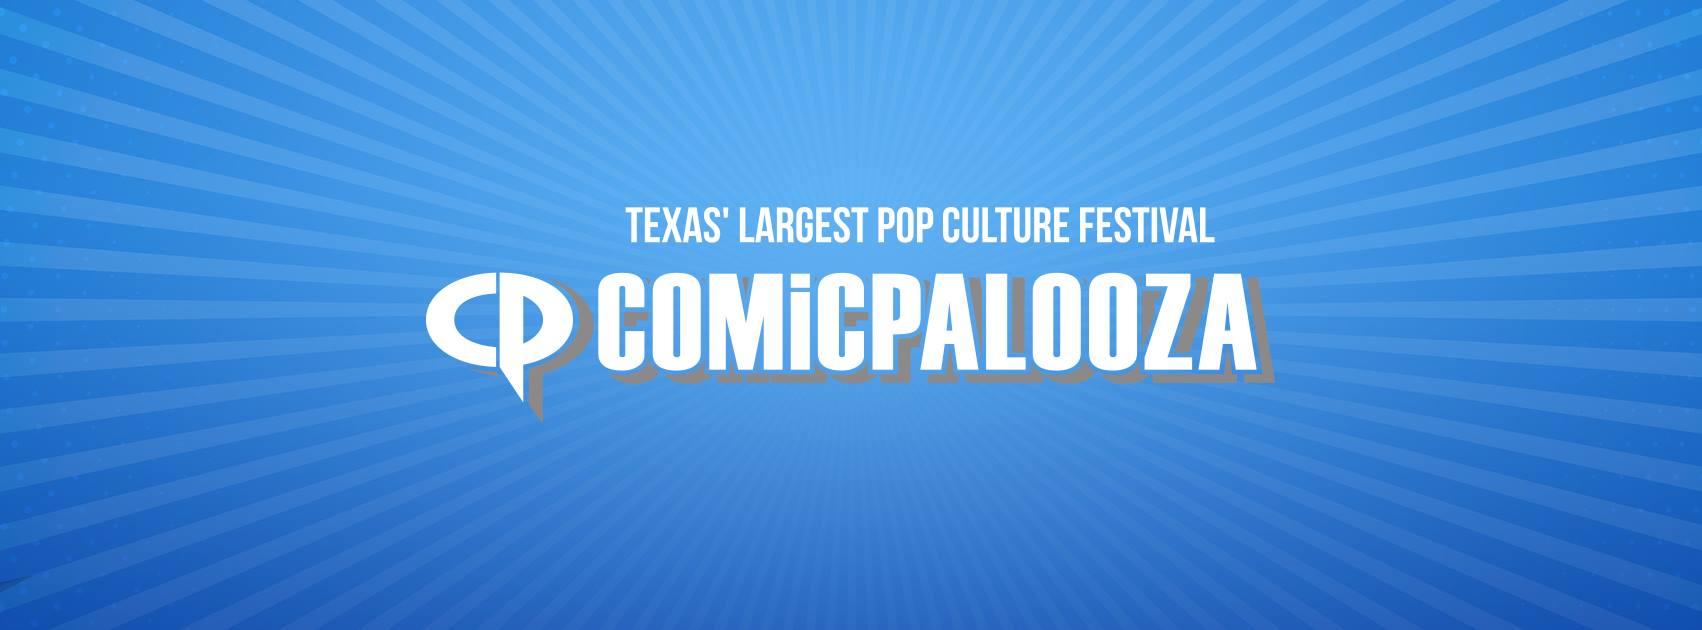 Photo Credit: Comicpalooza